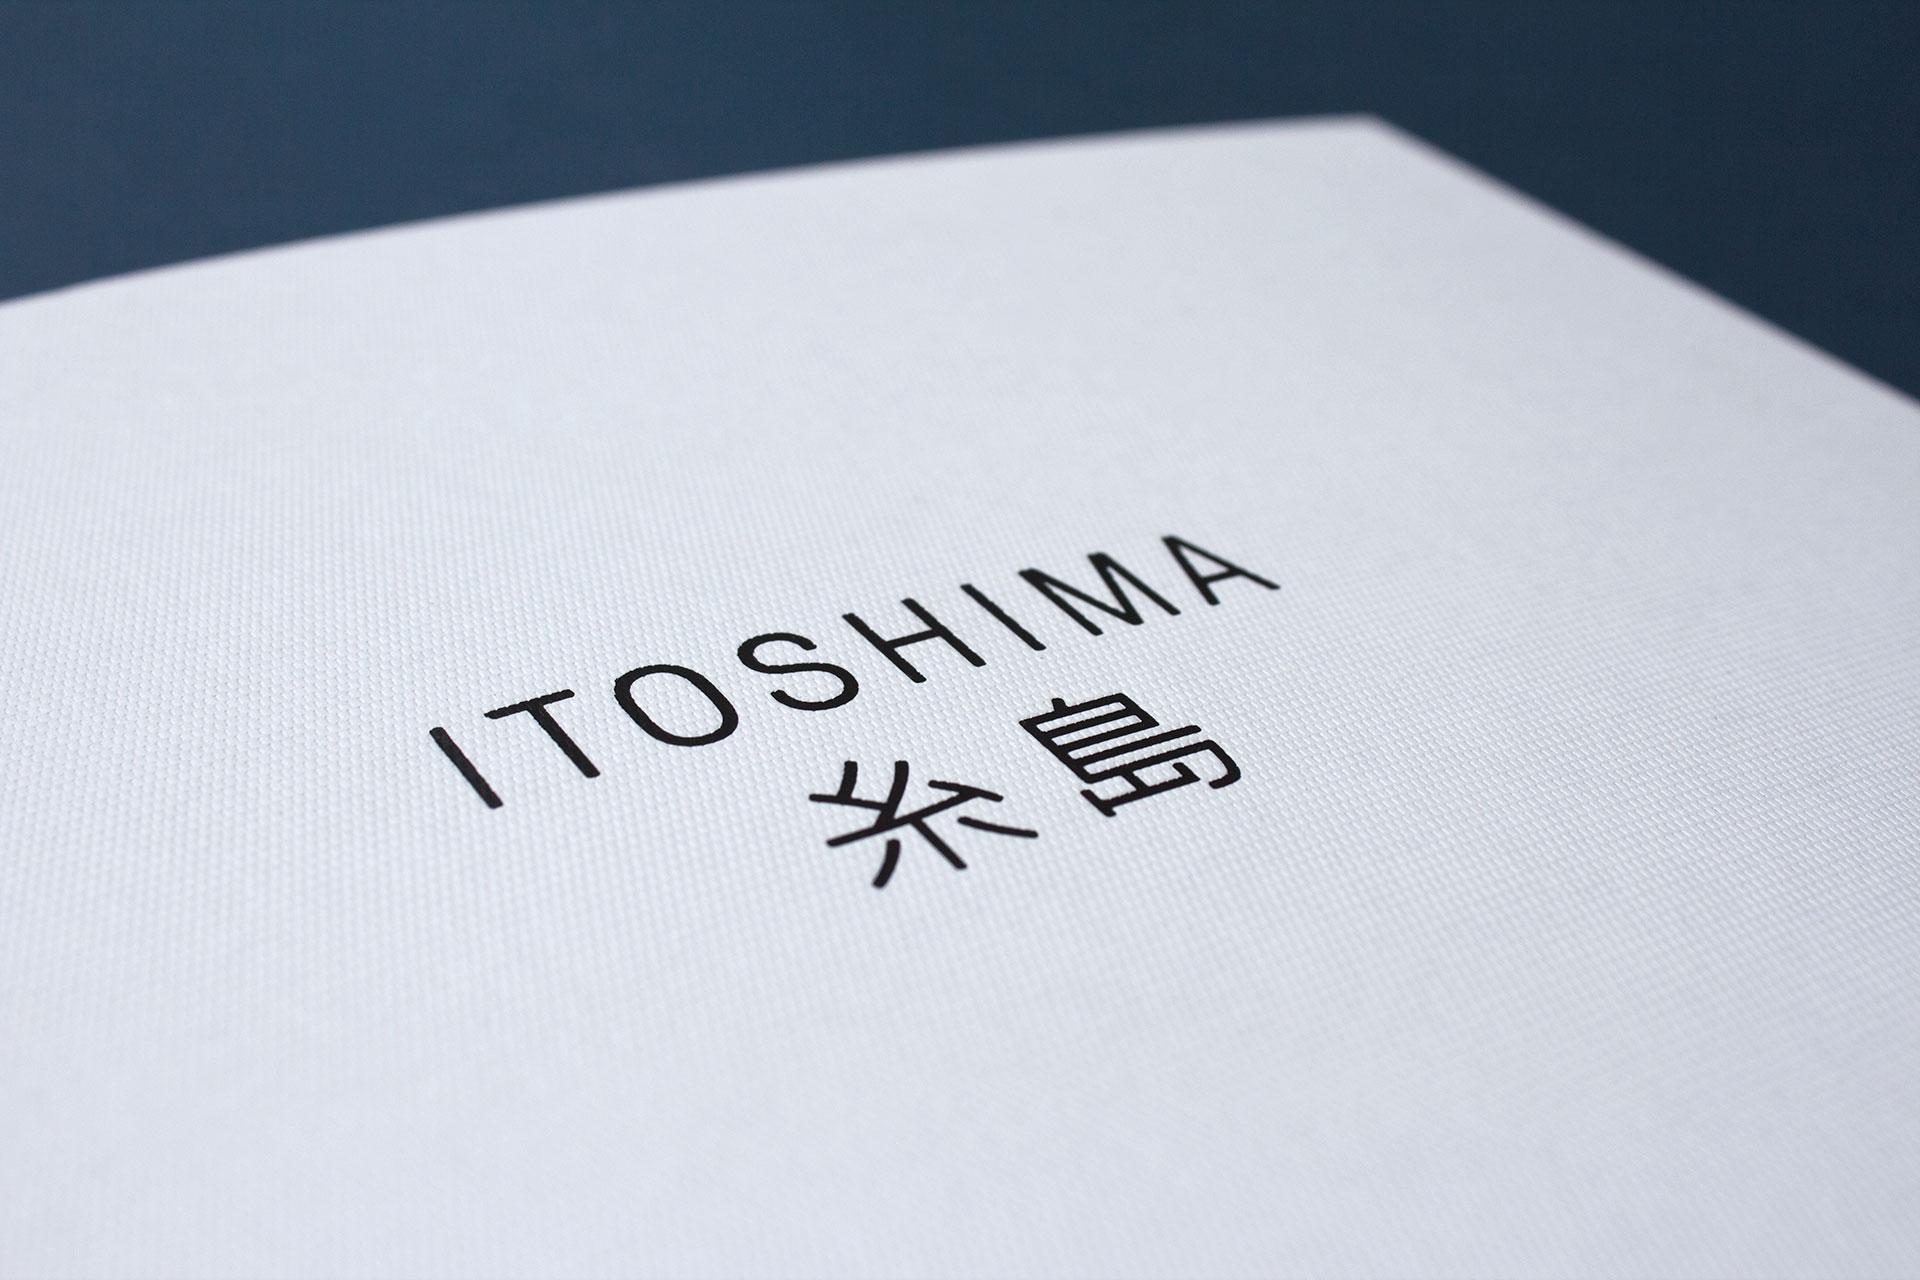 ITSHM_Fullscreen_4